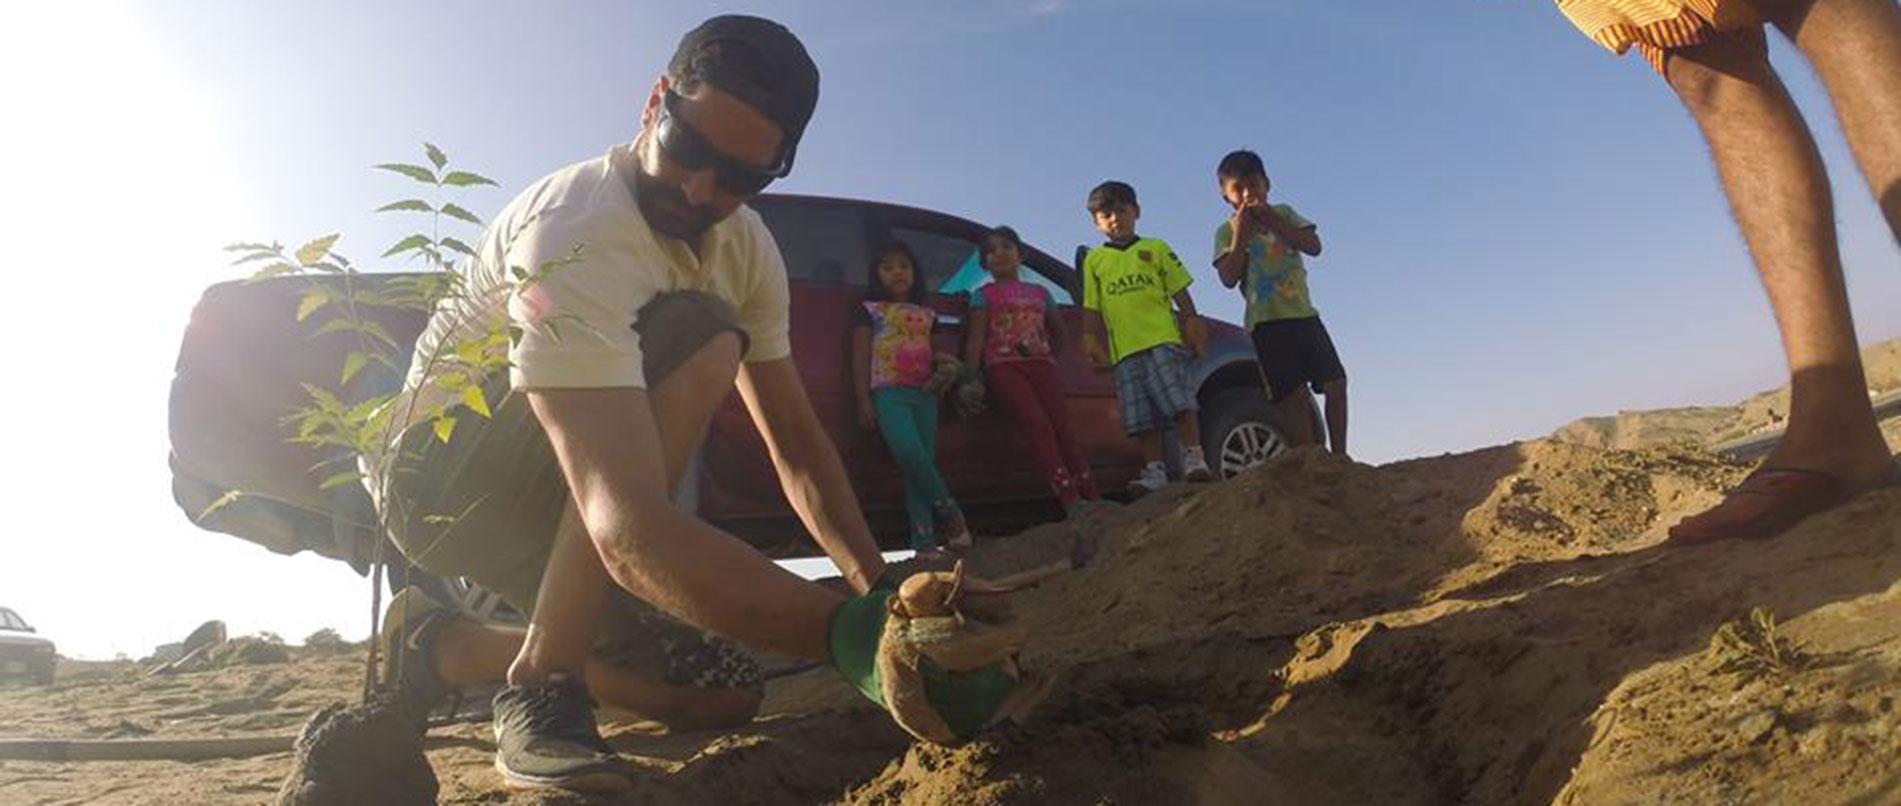 Peru Environmental Conservation Project Global Nomadic